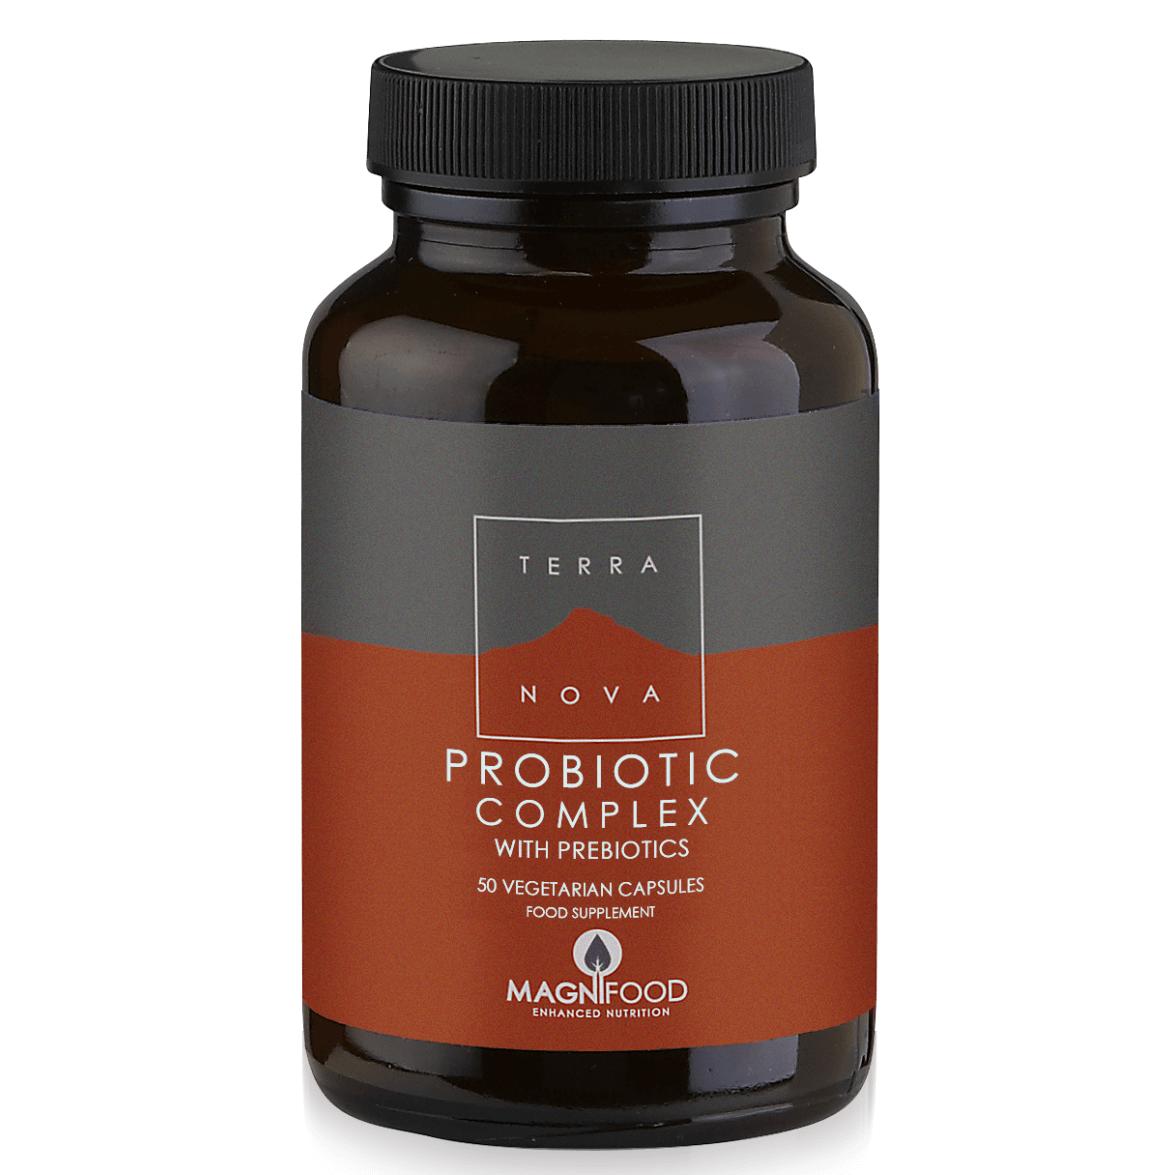 Terranova Probiotic Complex with Ρrebiotics Μοναδικός Συνδυασμός Προβιοτικών, Πρεβιοτικών με Μέγιστη Αποτελεσματικότητα 50Caps